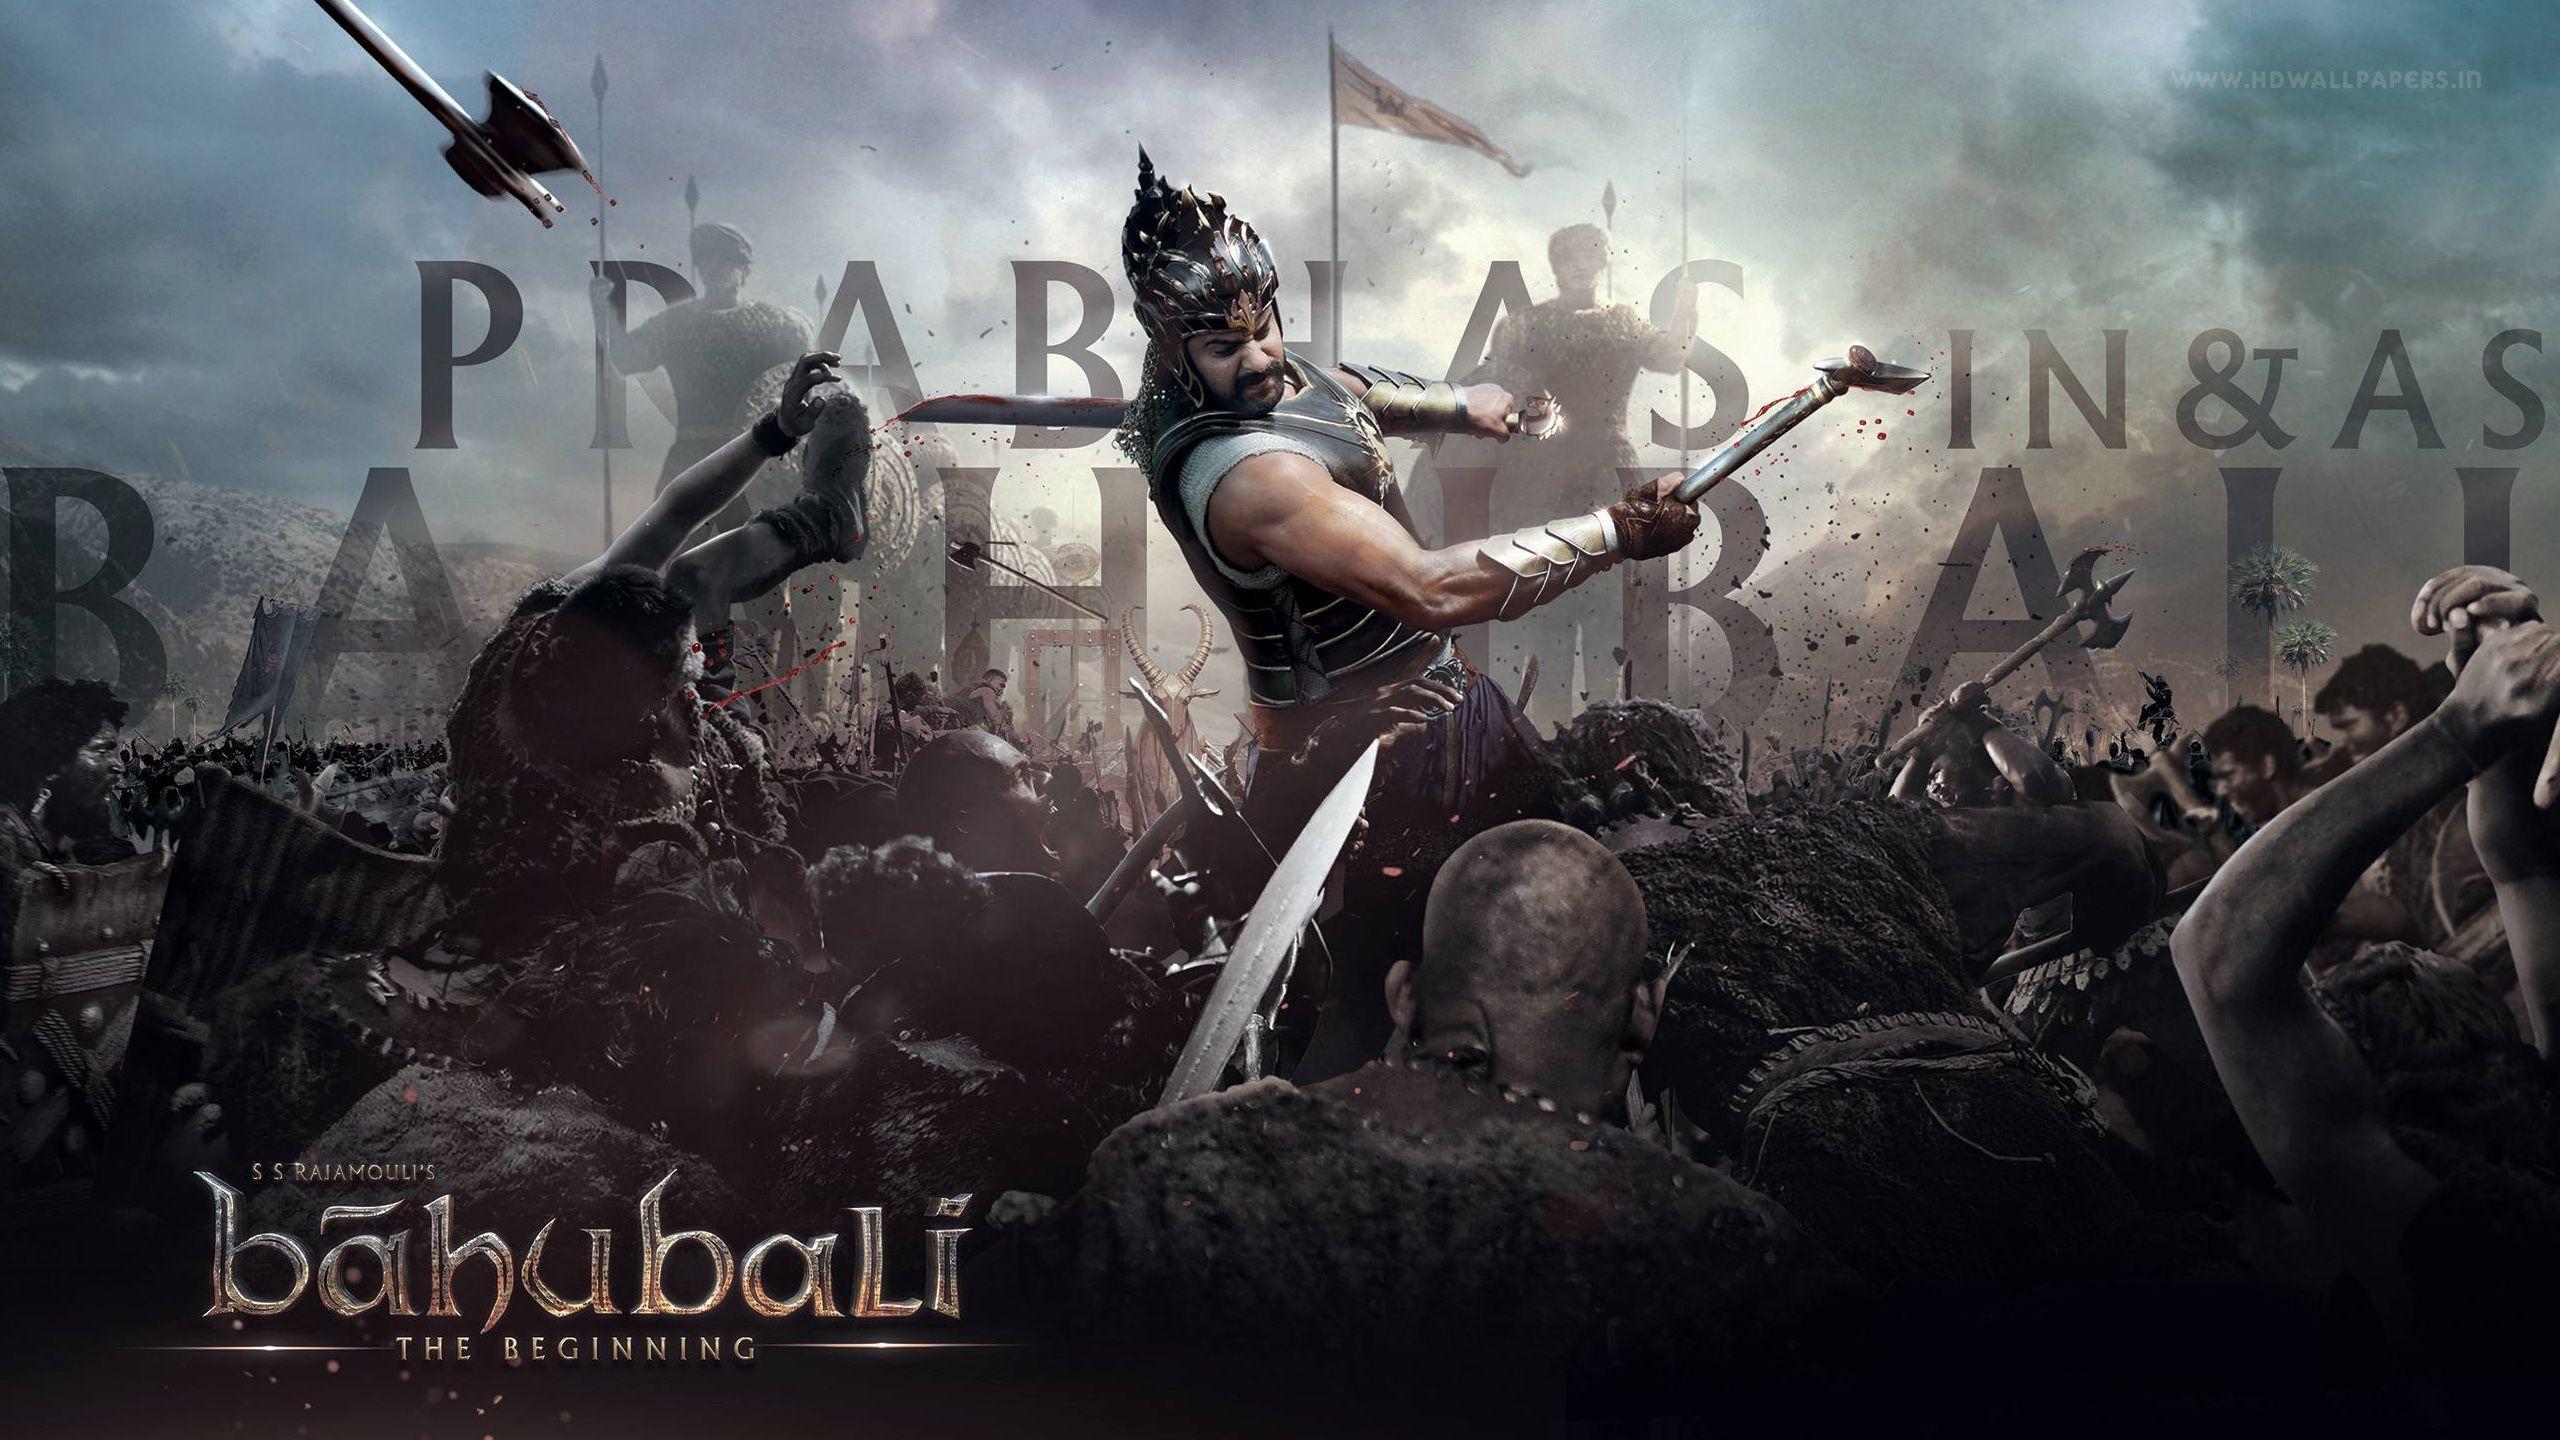 Prabhas Bahubali Wallpapers | HD Wallpapers